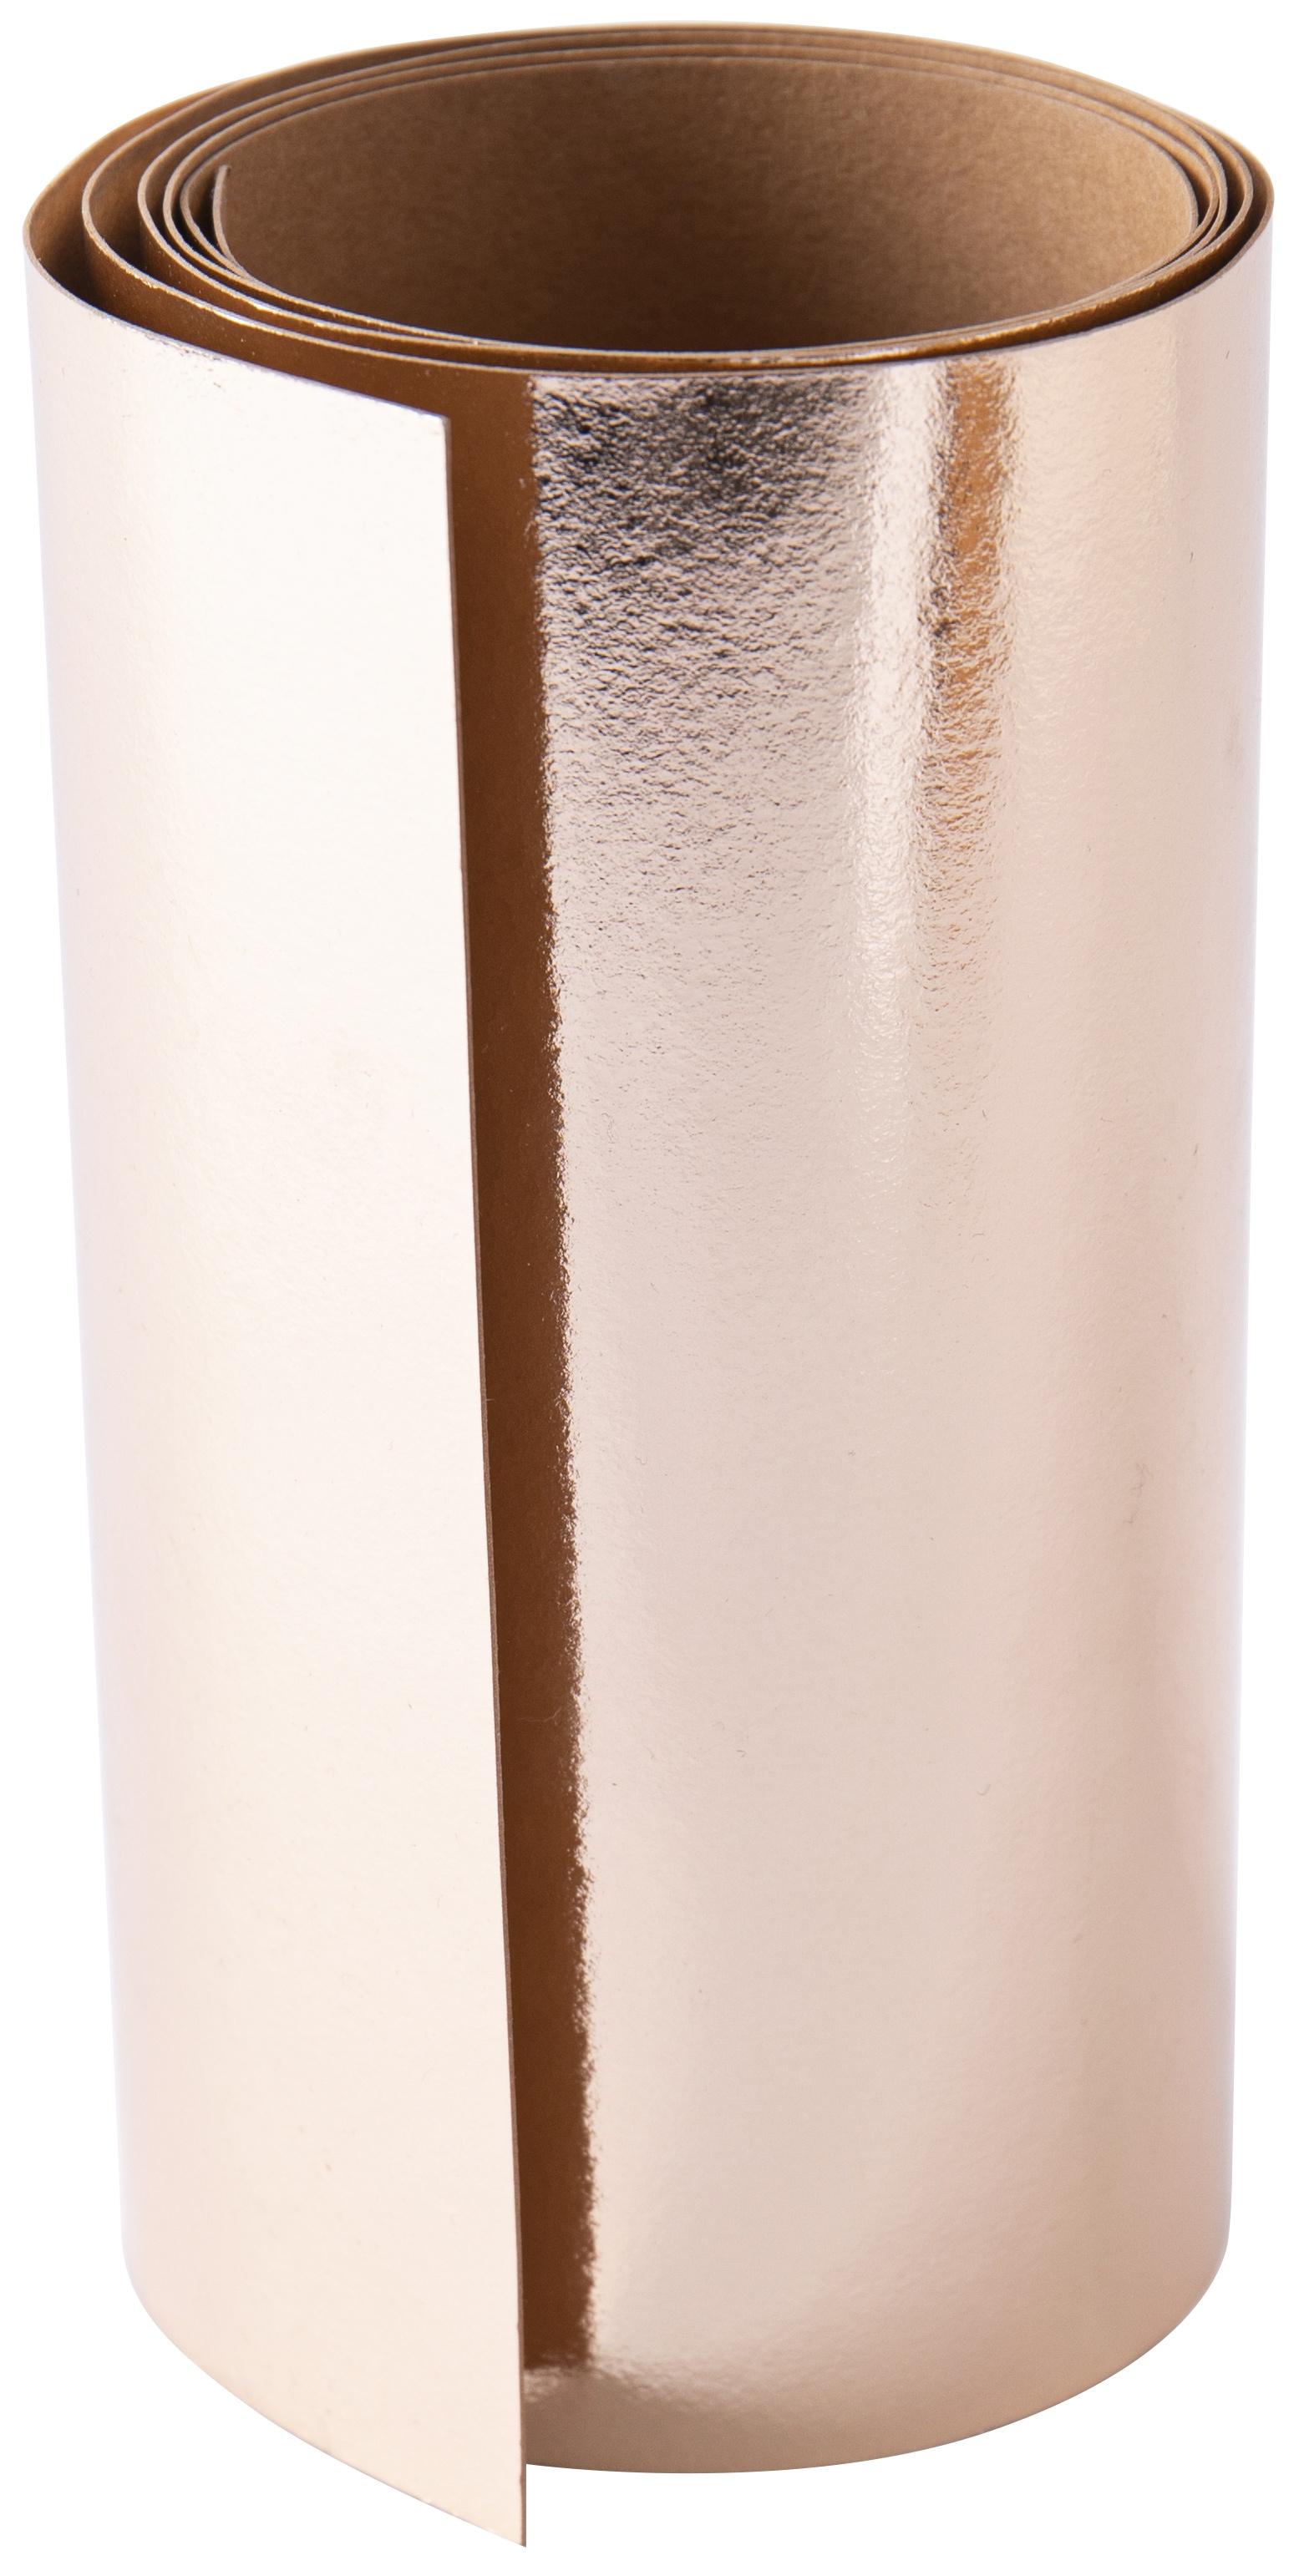 Sizzix Surfacez Texture Roll 6X48 - Rose Gold